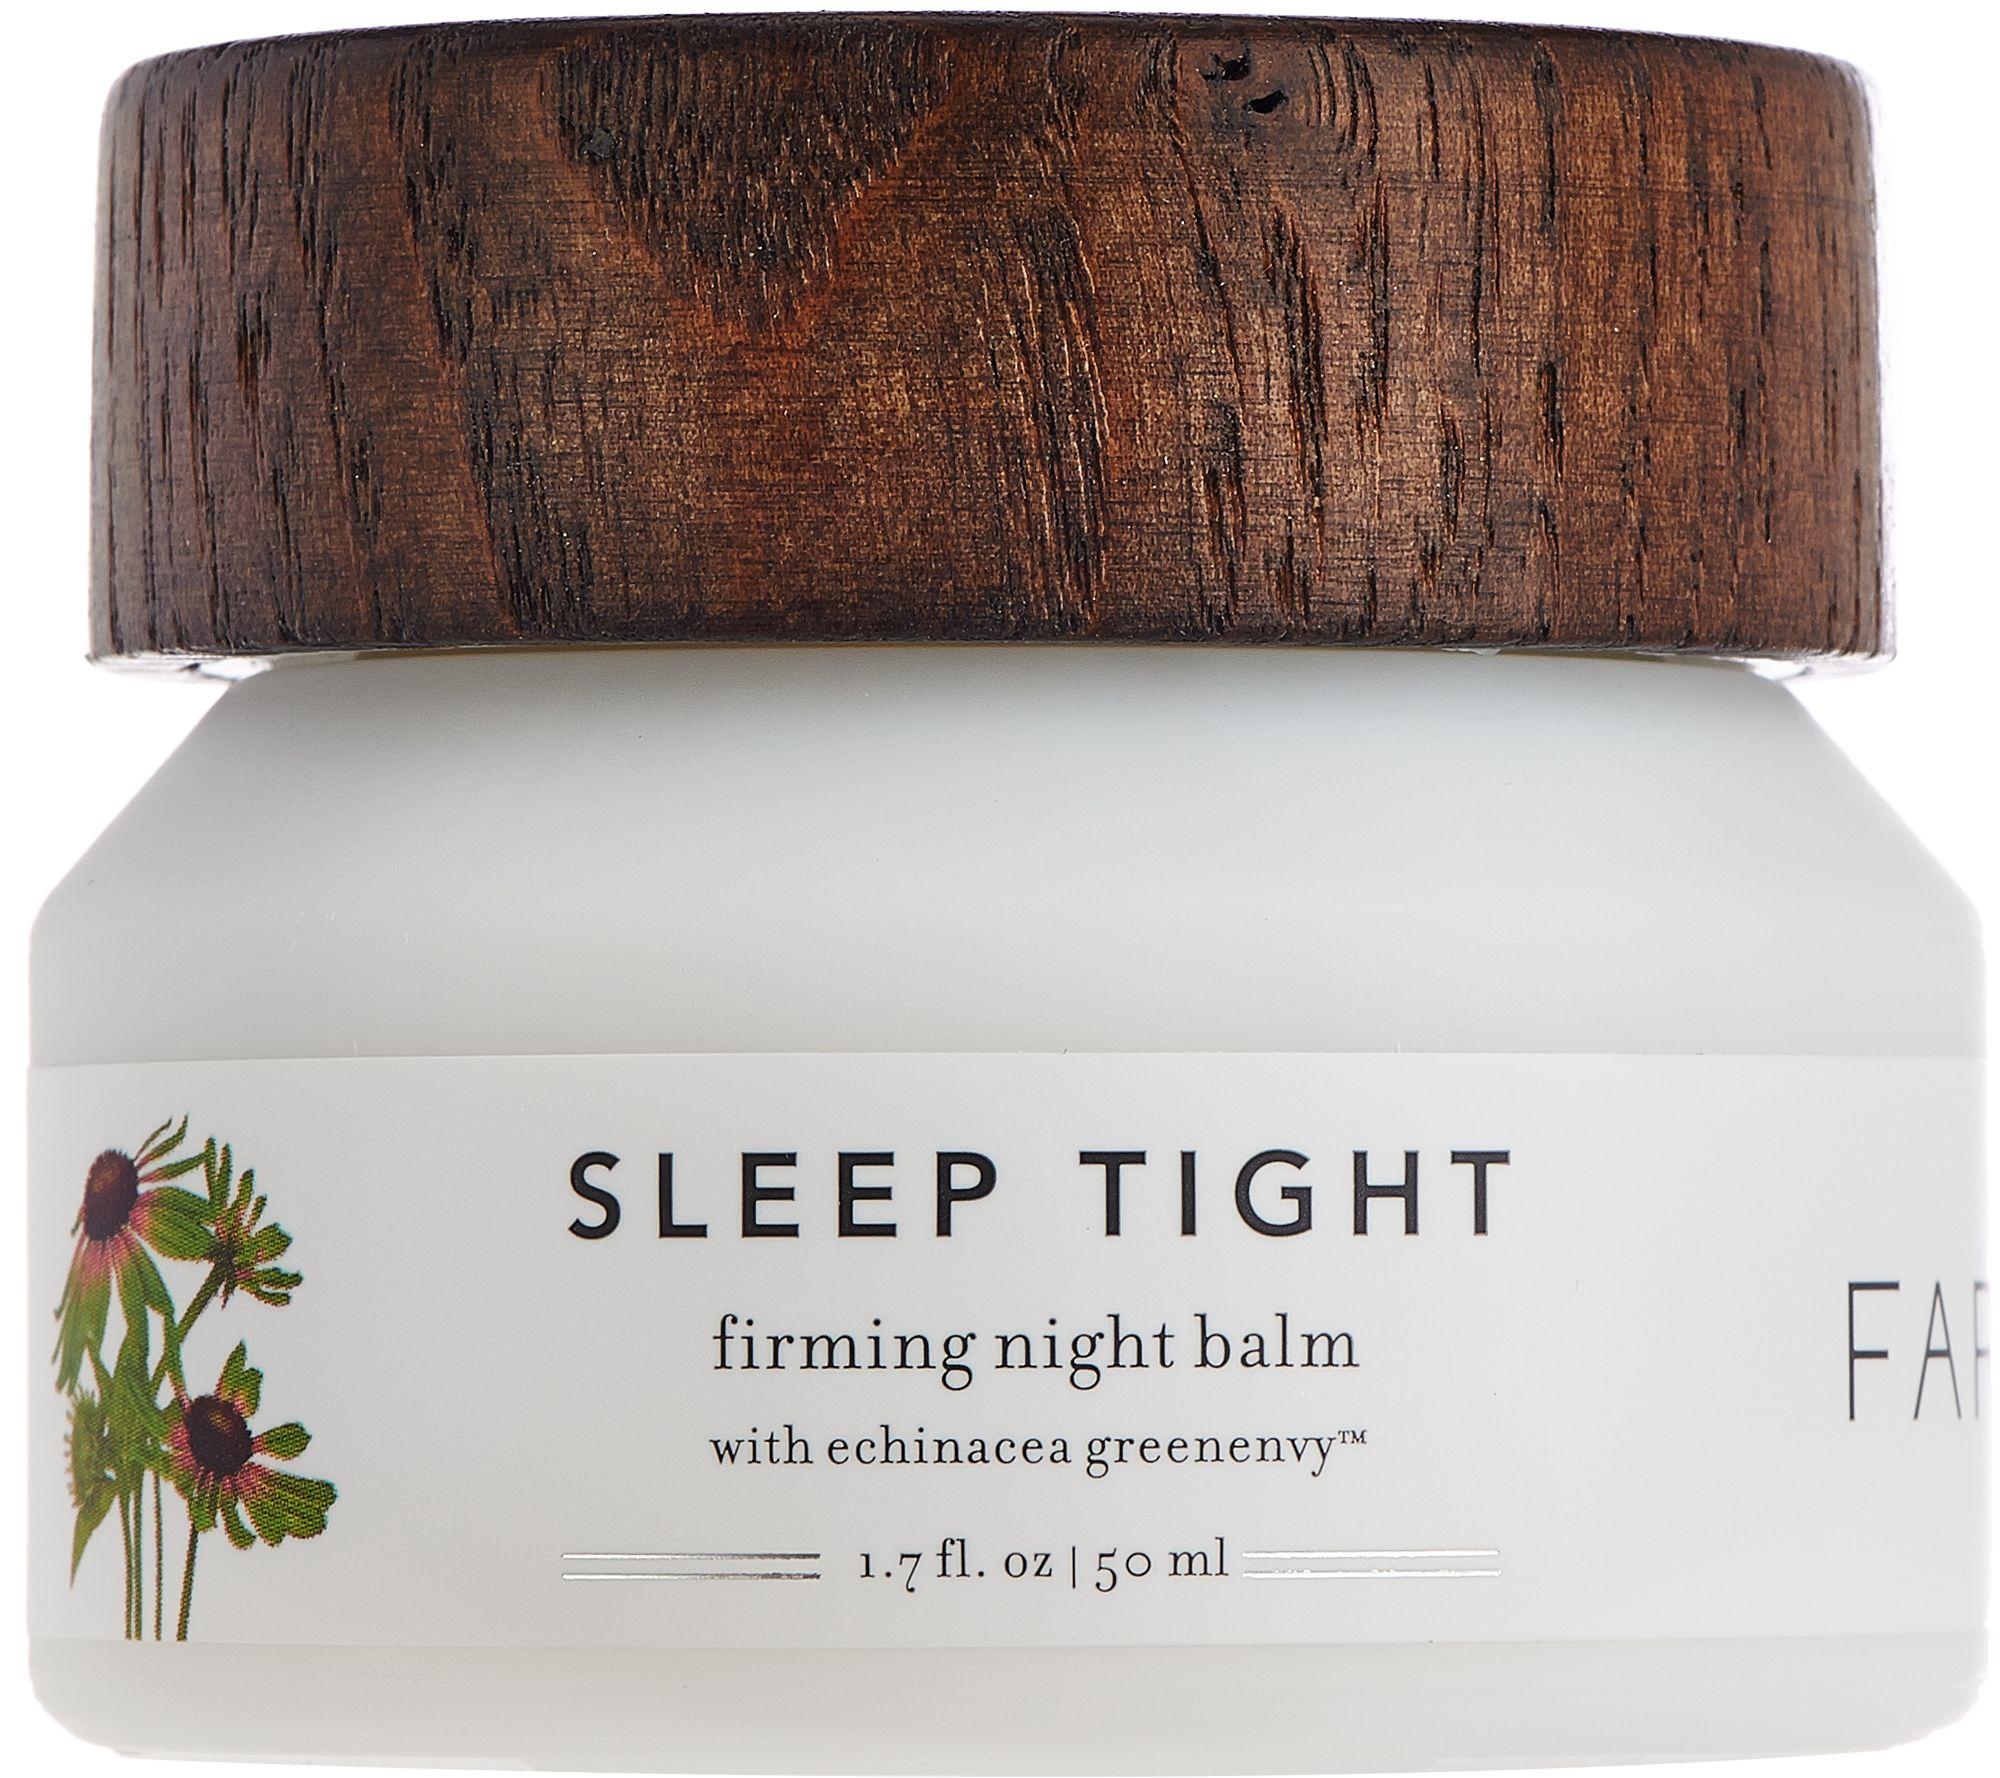 New customer qvc promo code - Farmacy Sleep Tight Firming Night Balm A280474